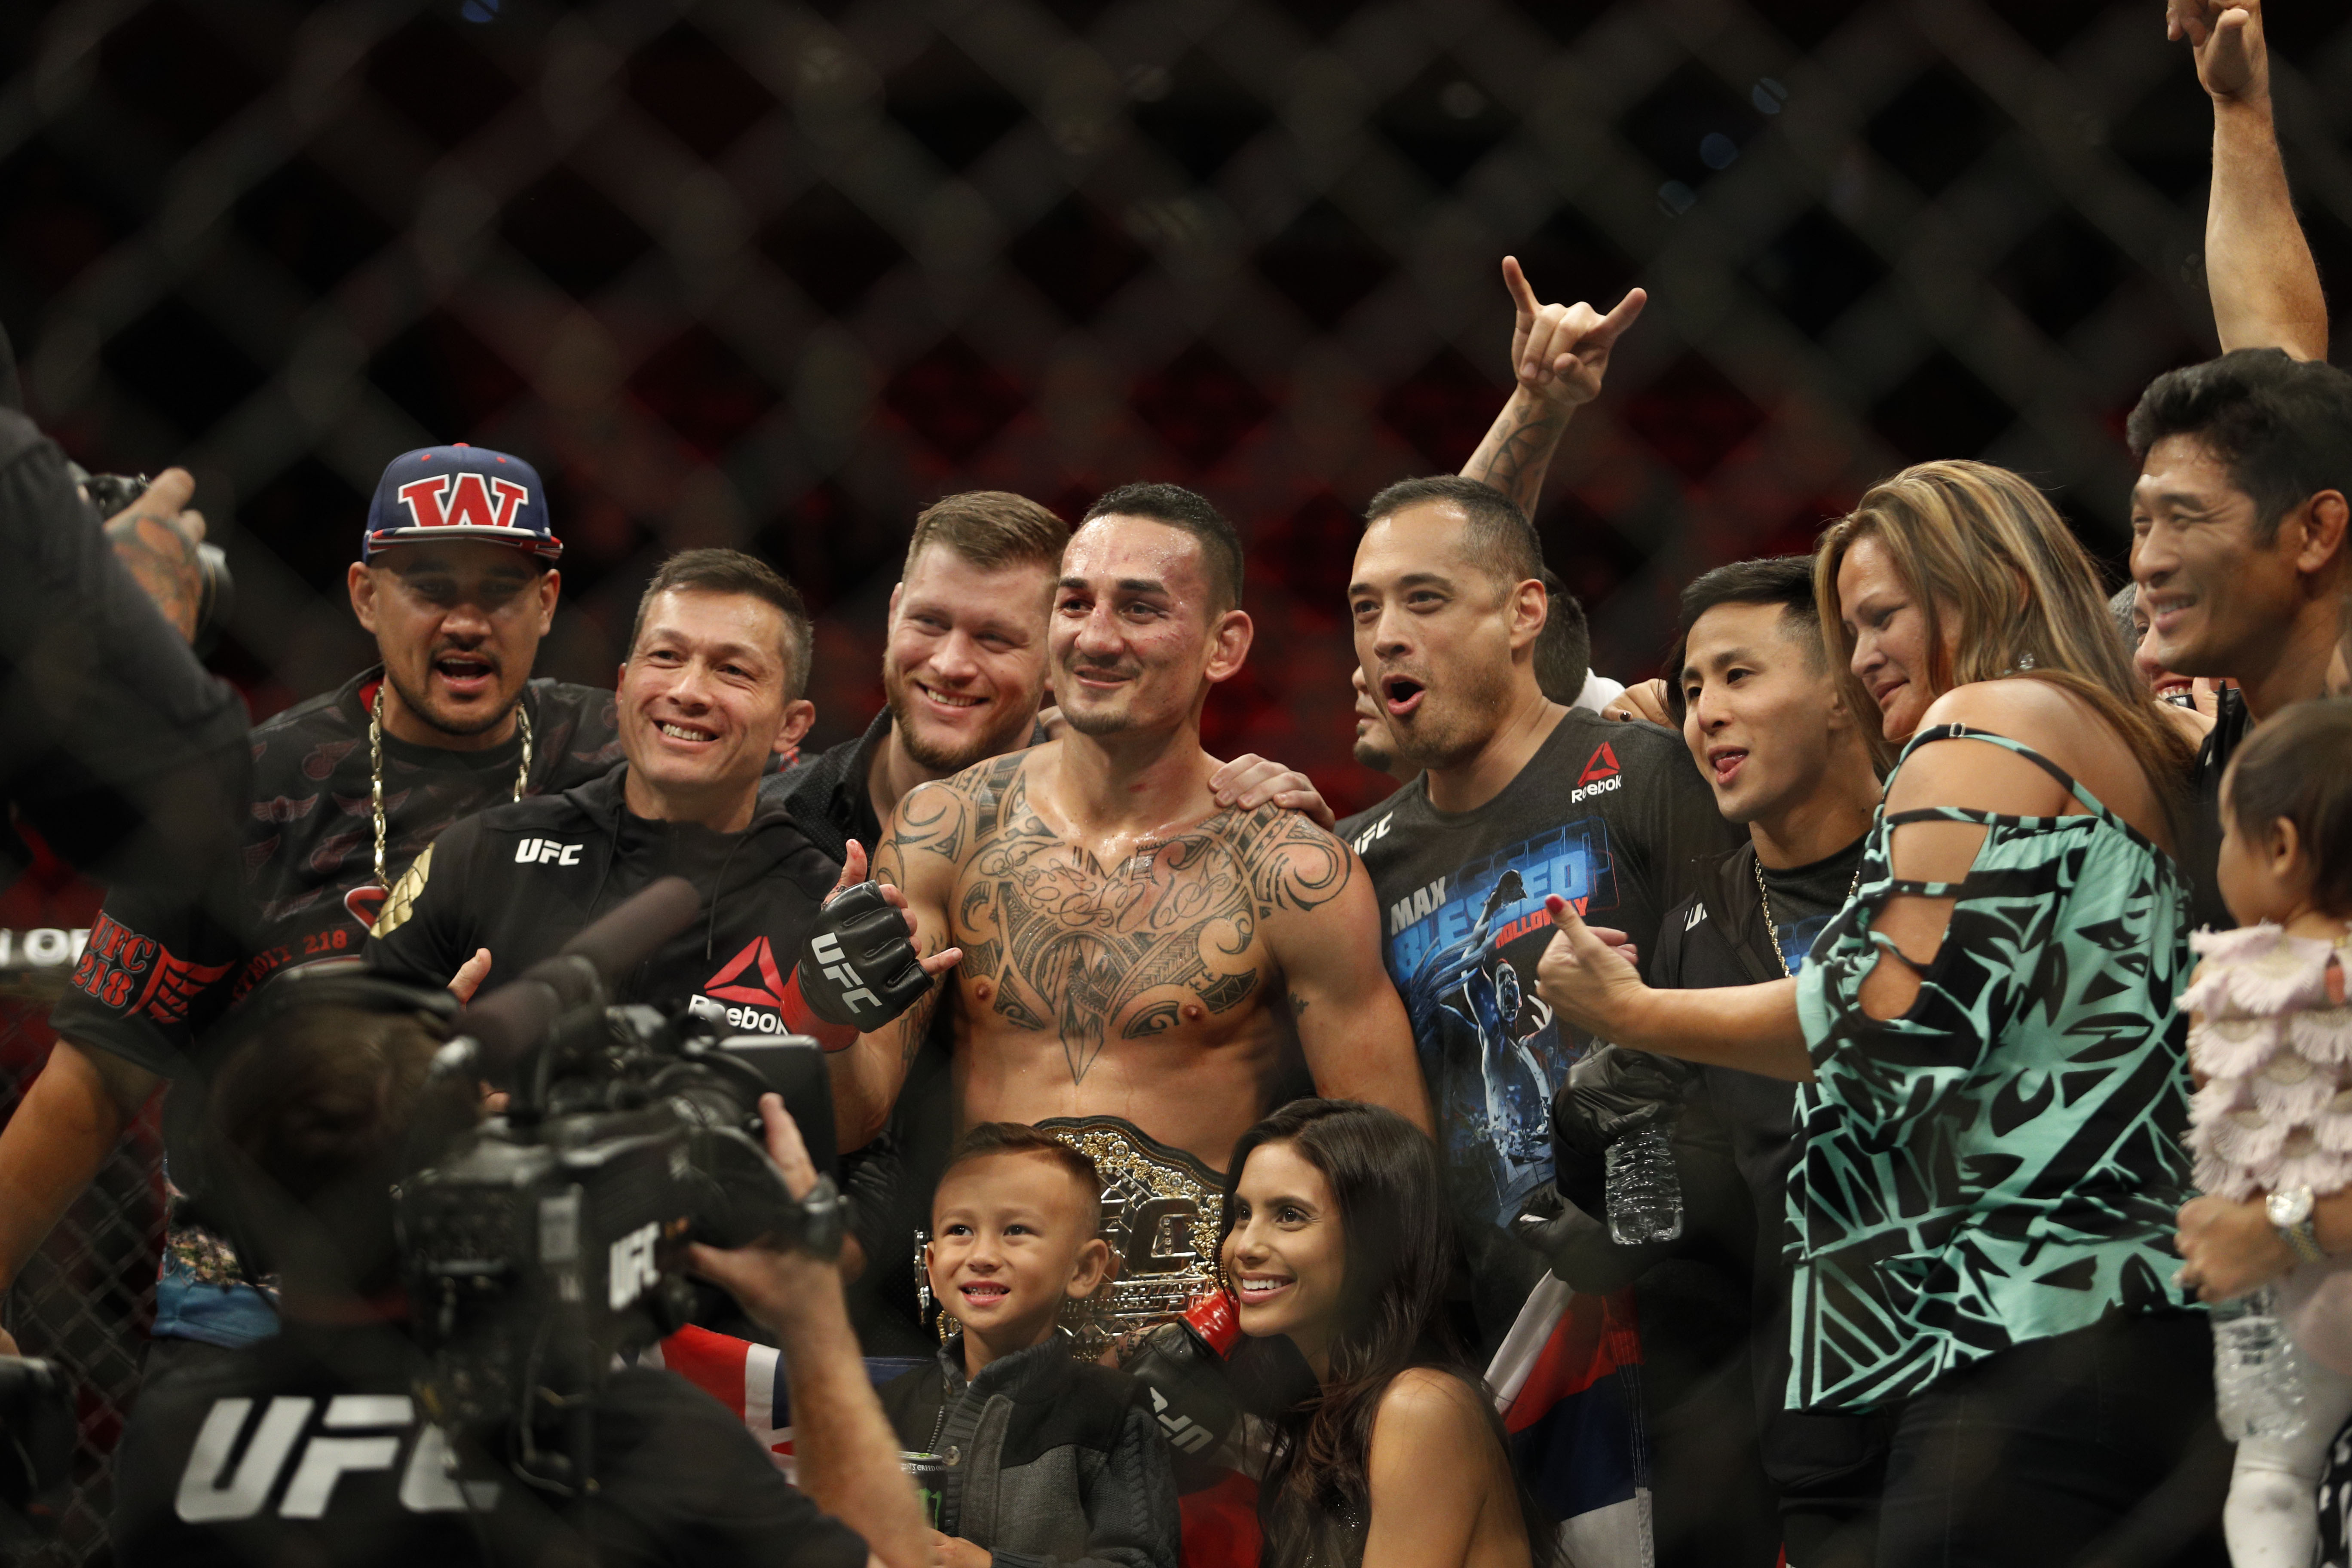 MMA: UFC 218-Holloway vs Aldo